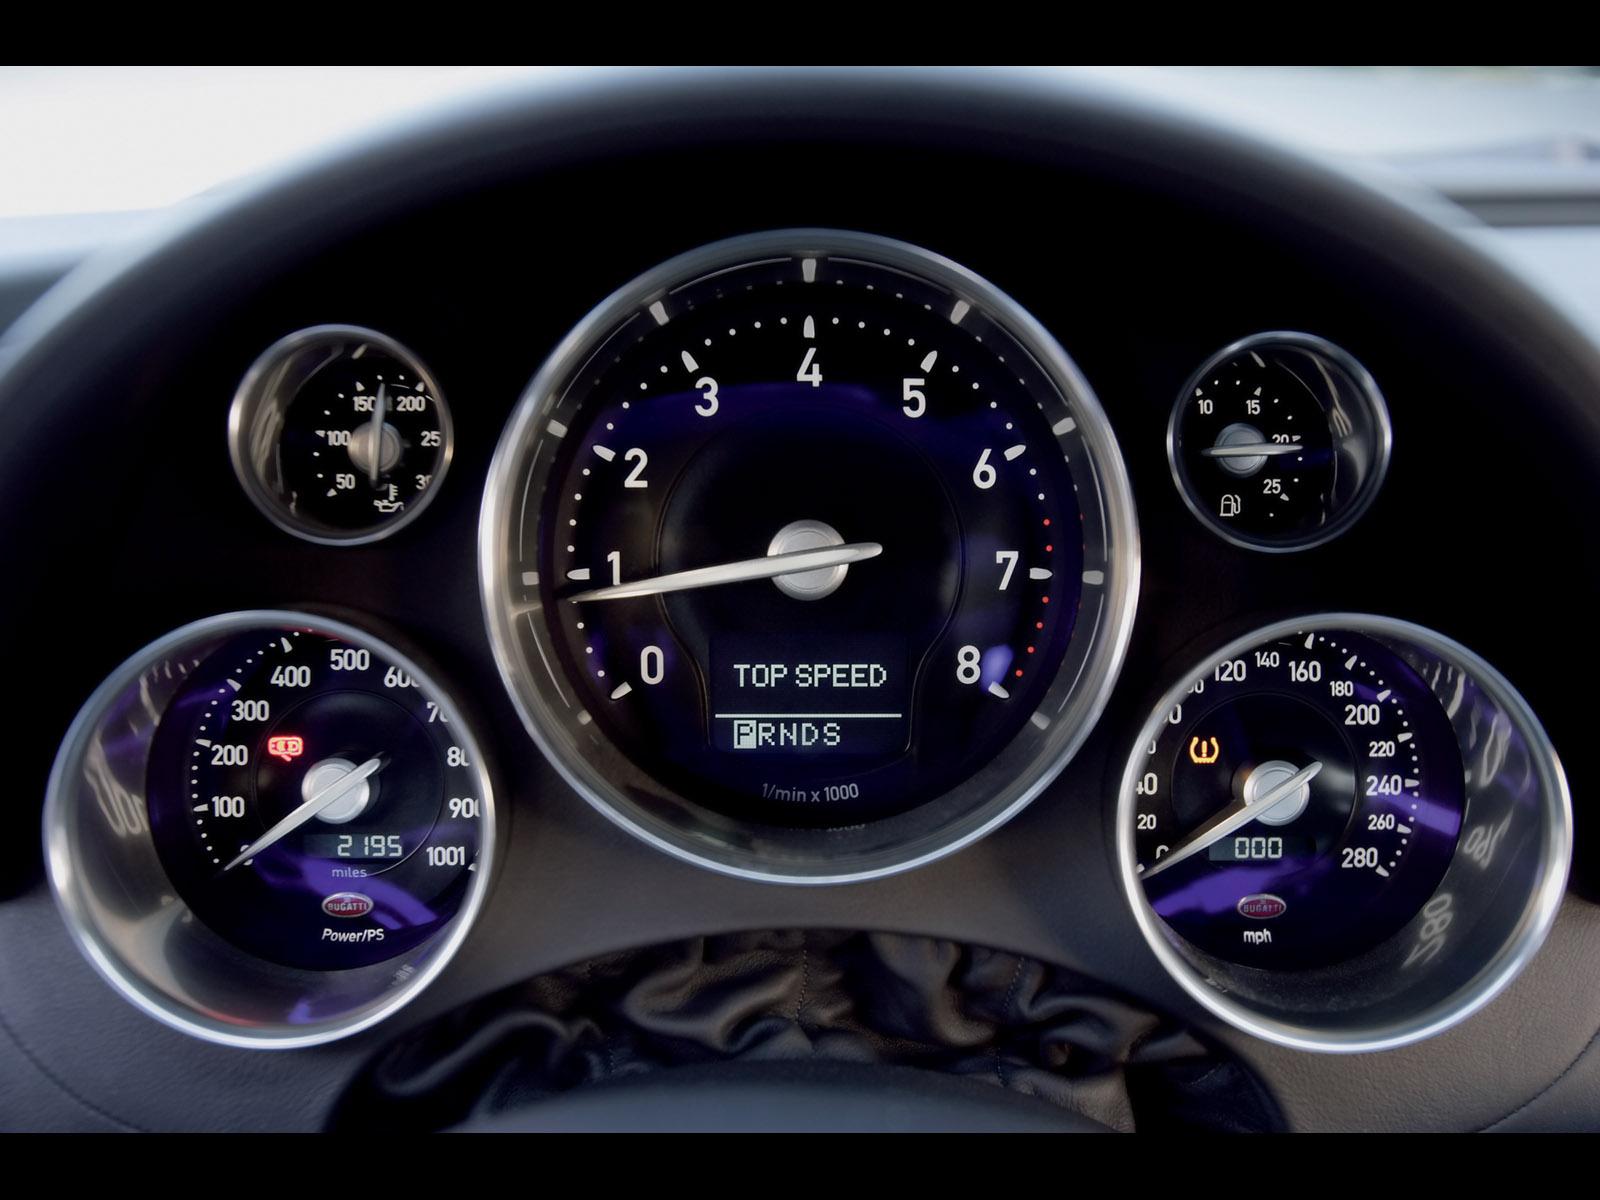 wallpaper-126482 Wonderful Bugatti Veyron On Road Price Cars Trend